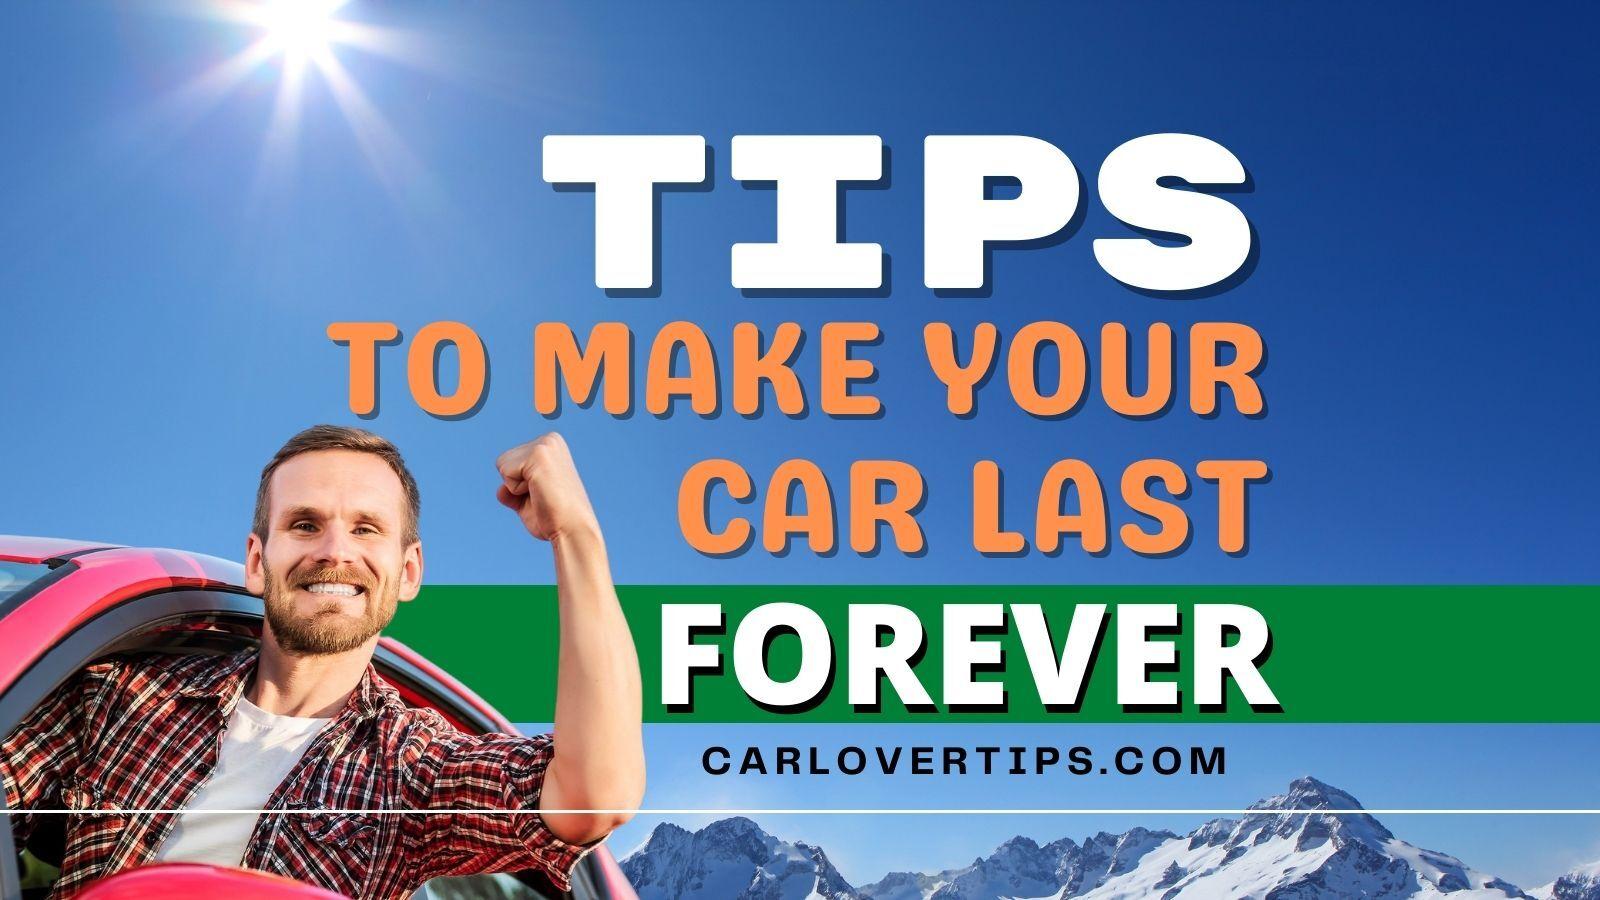 Tips to Make Your Car Last Forever Good Car Maintenance Tips Car Lover Tips Social